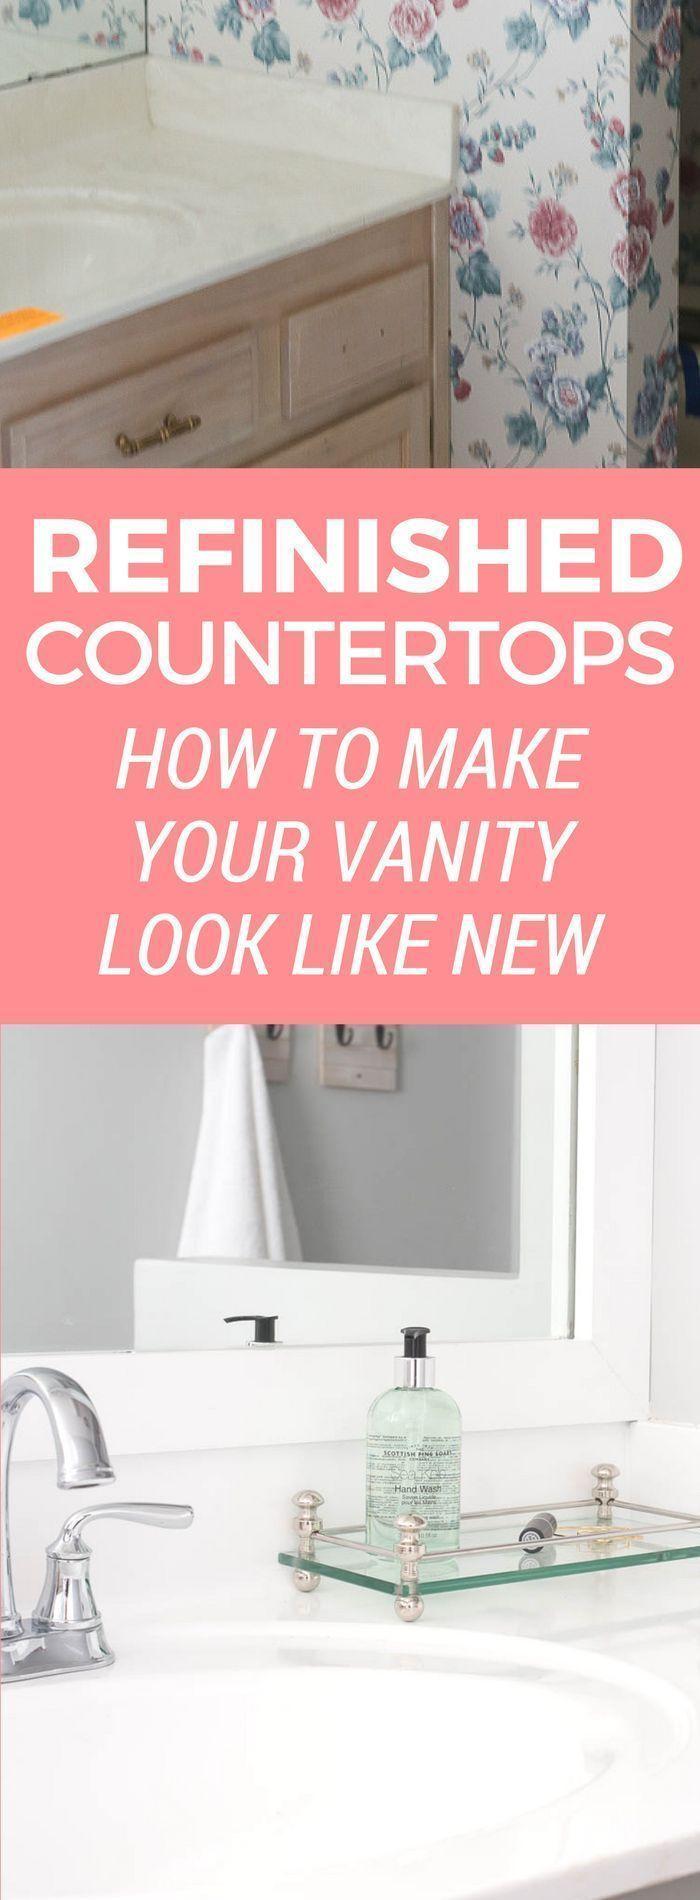 367 best bathroom images on pinterest bathroom bathroom - How to refinish a bathroom vanity ...